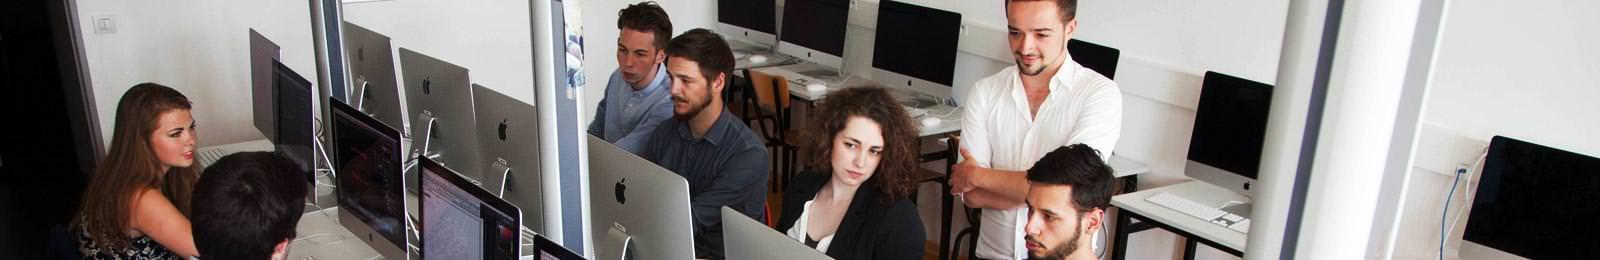 master web - digital campus